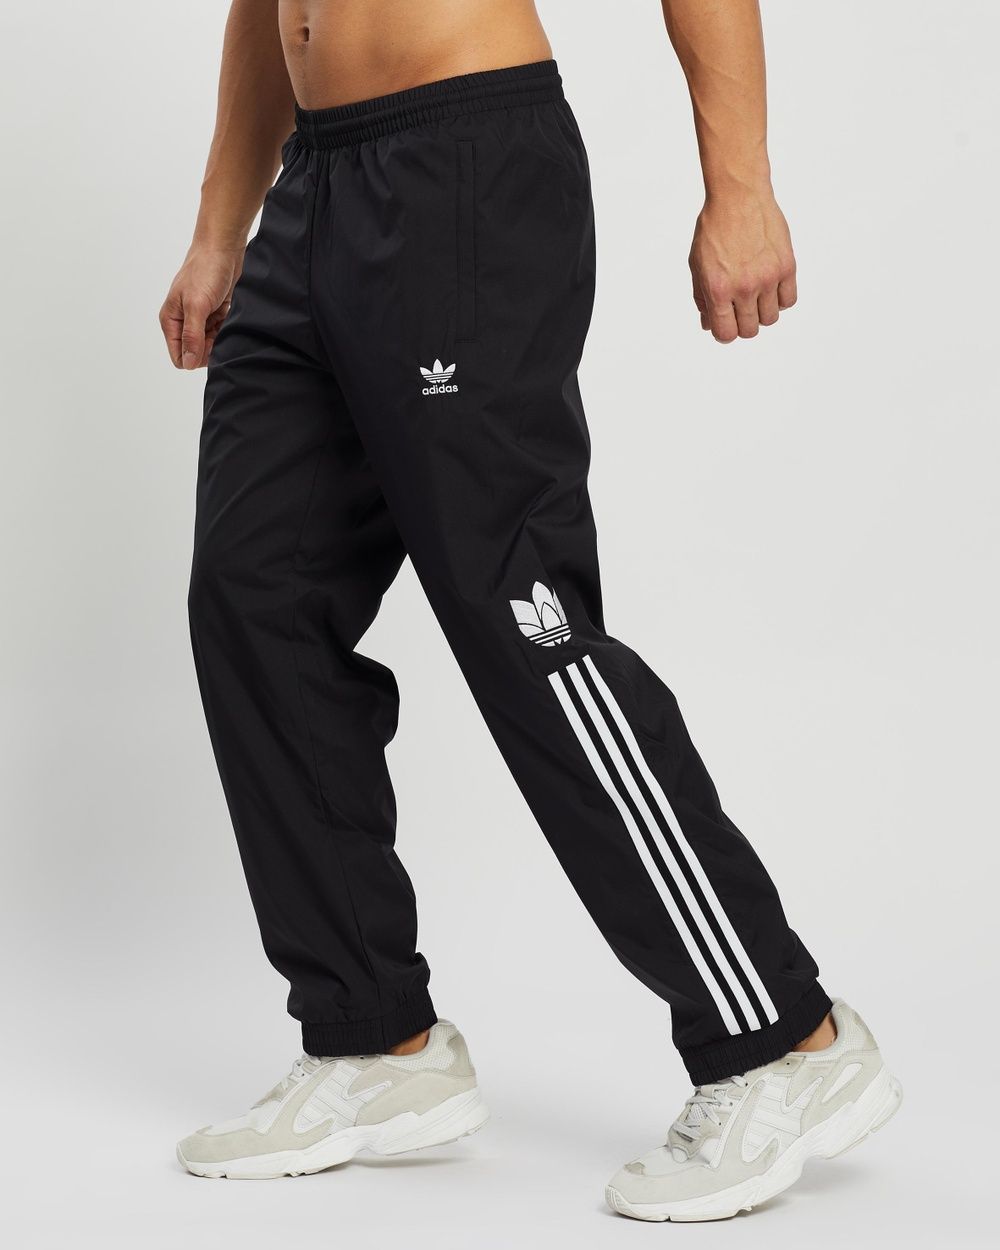 adidas Originals Adicolor 3D Trefoil 3 Stripes Track Pants Black 3-Stripes